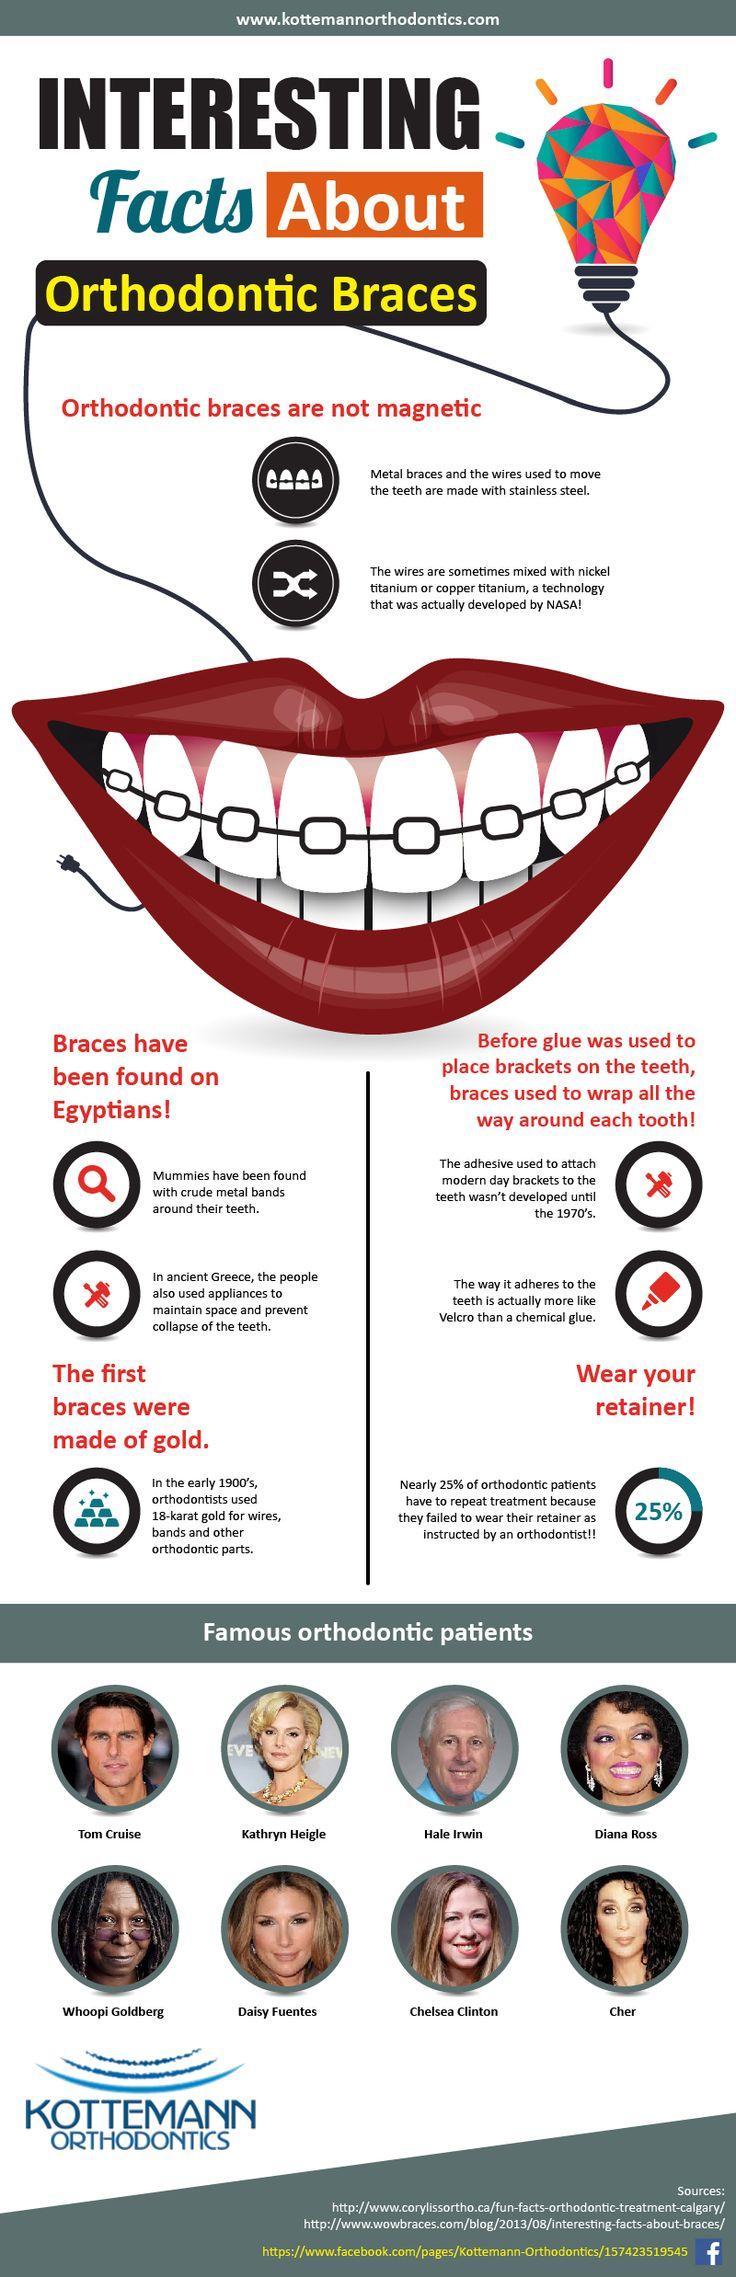 27 best All about braces images on Pinterest | Dental, Orthodontics ...